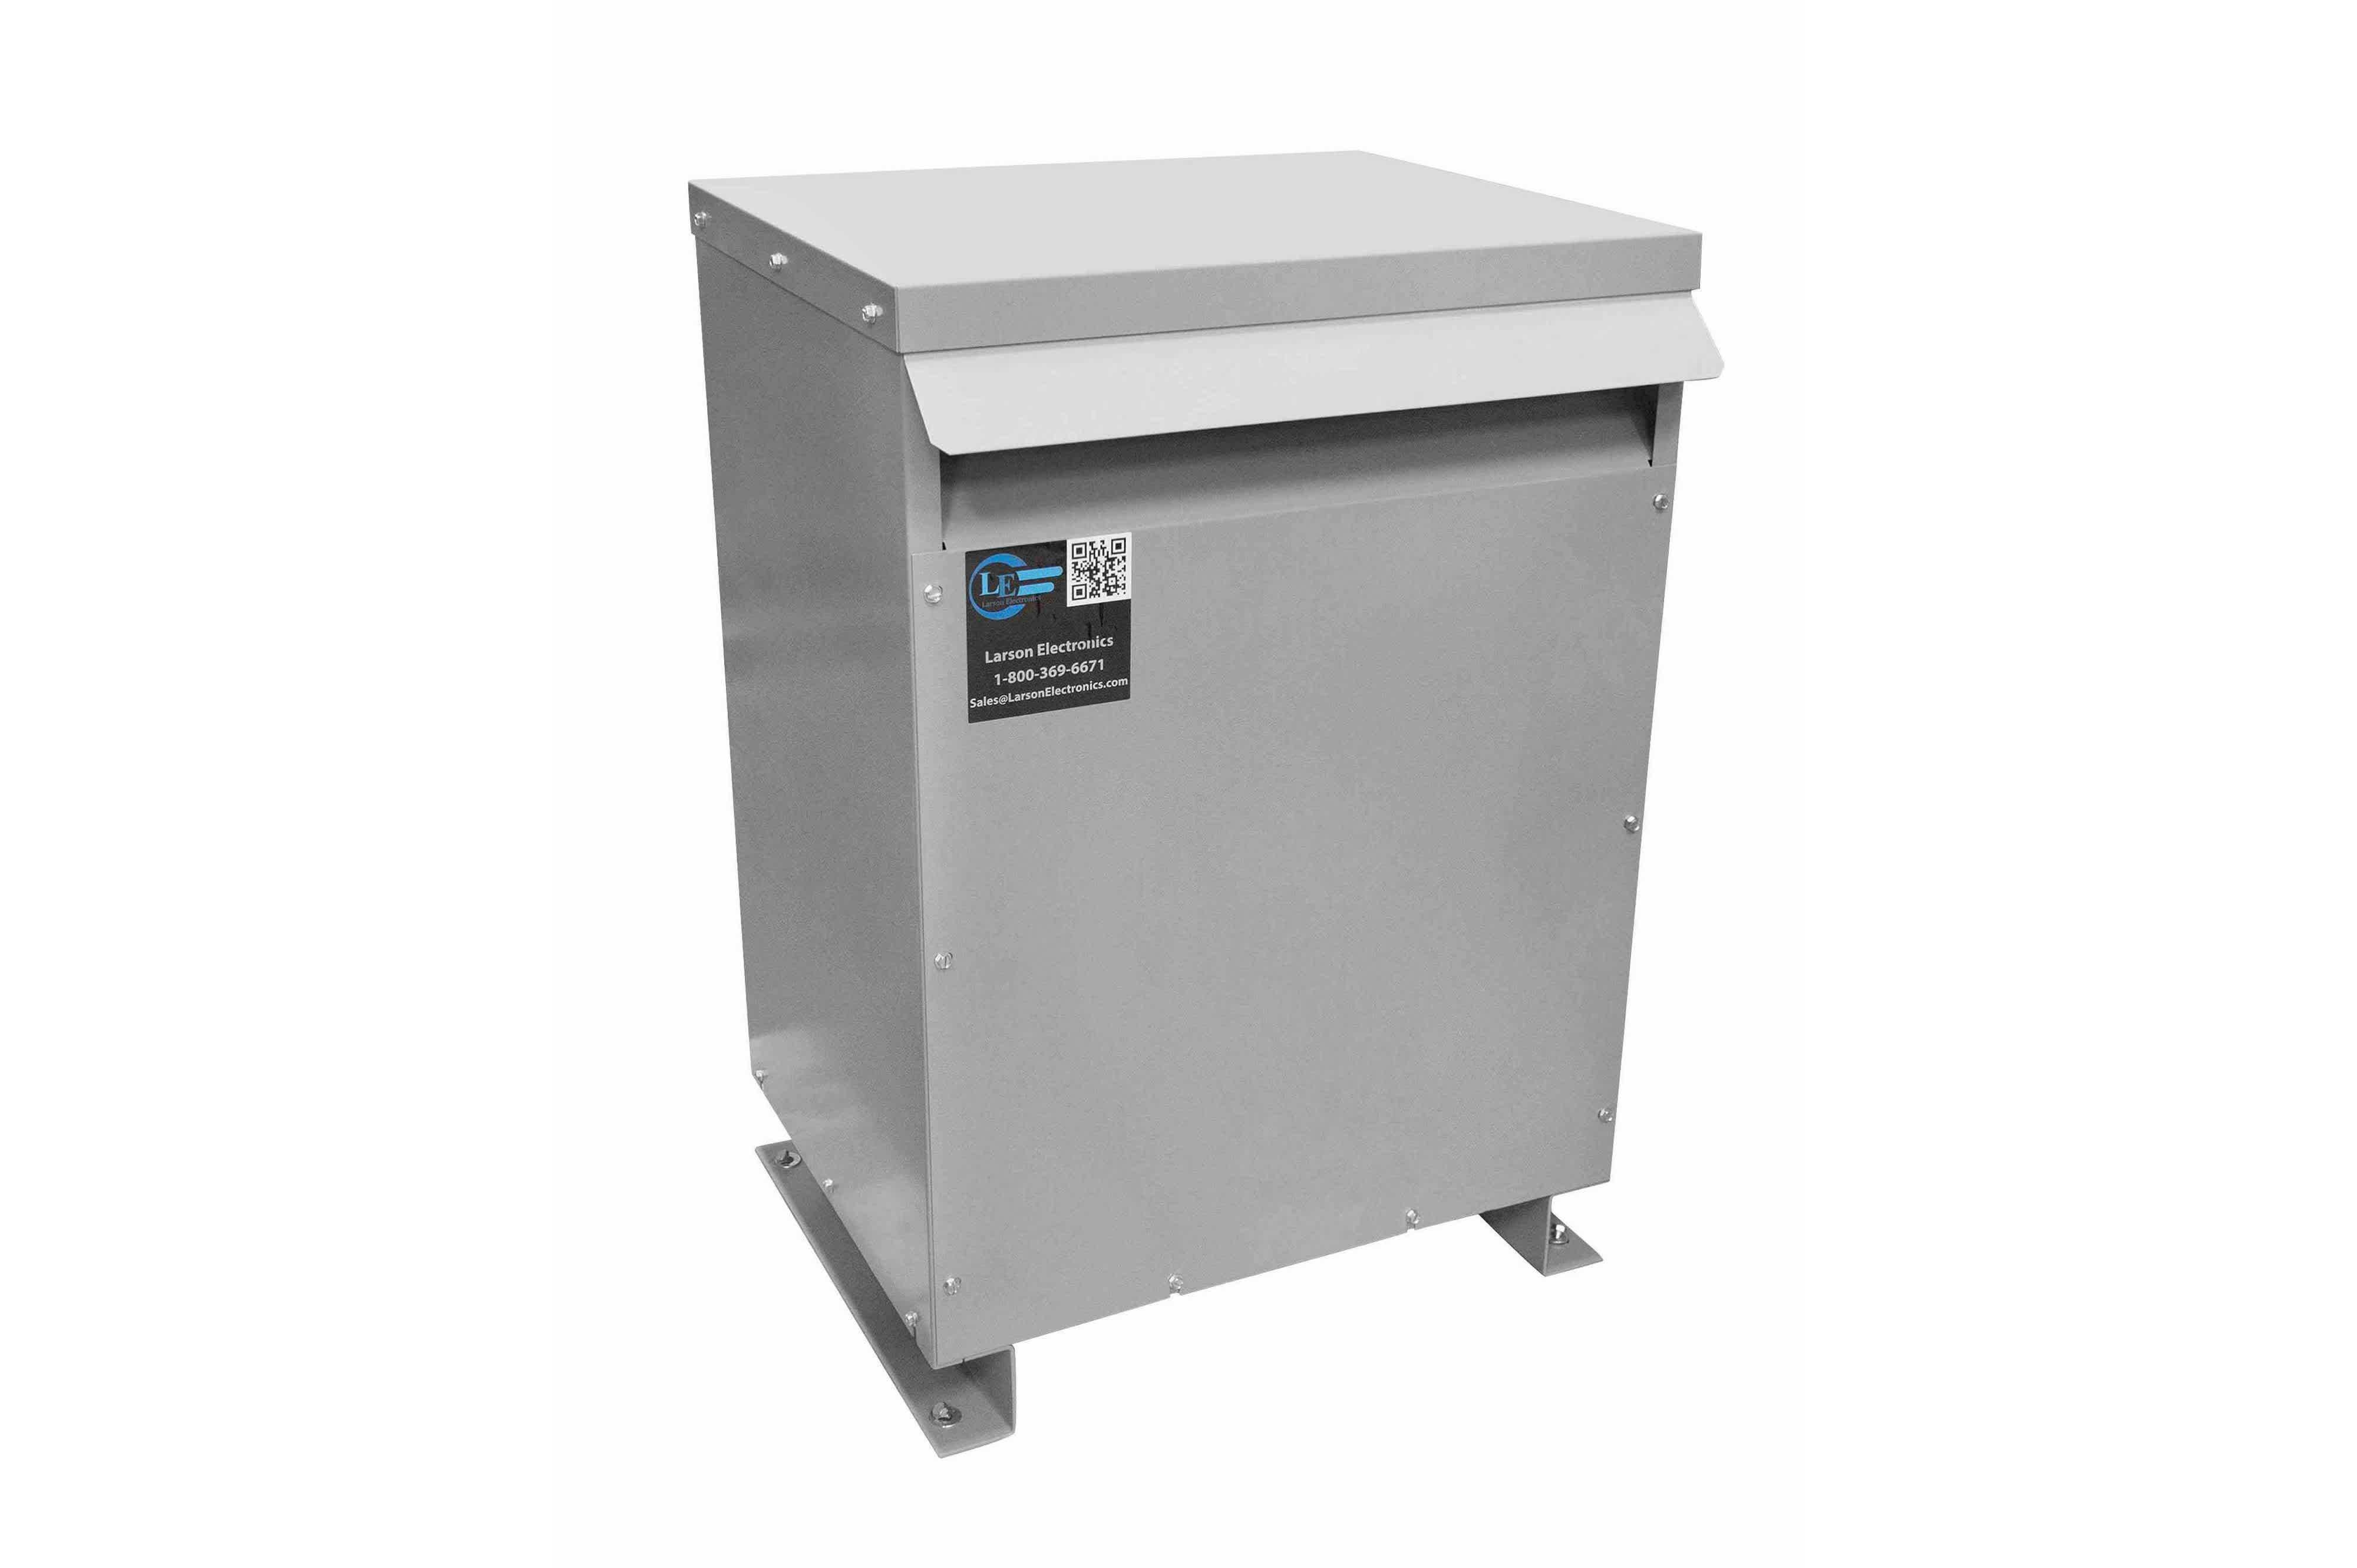 30 kVA 3PH Isolation Transformer, 480V Wye Primary, 600Y/347 Wye-N Secondary, N3R, Ventilated, 60 Hz